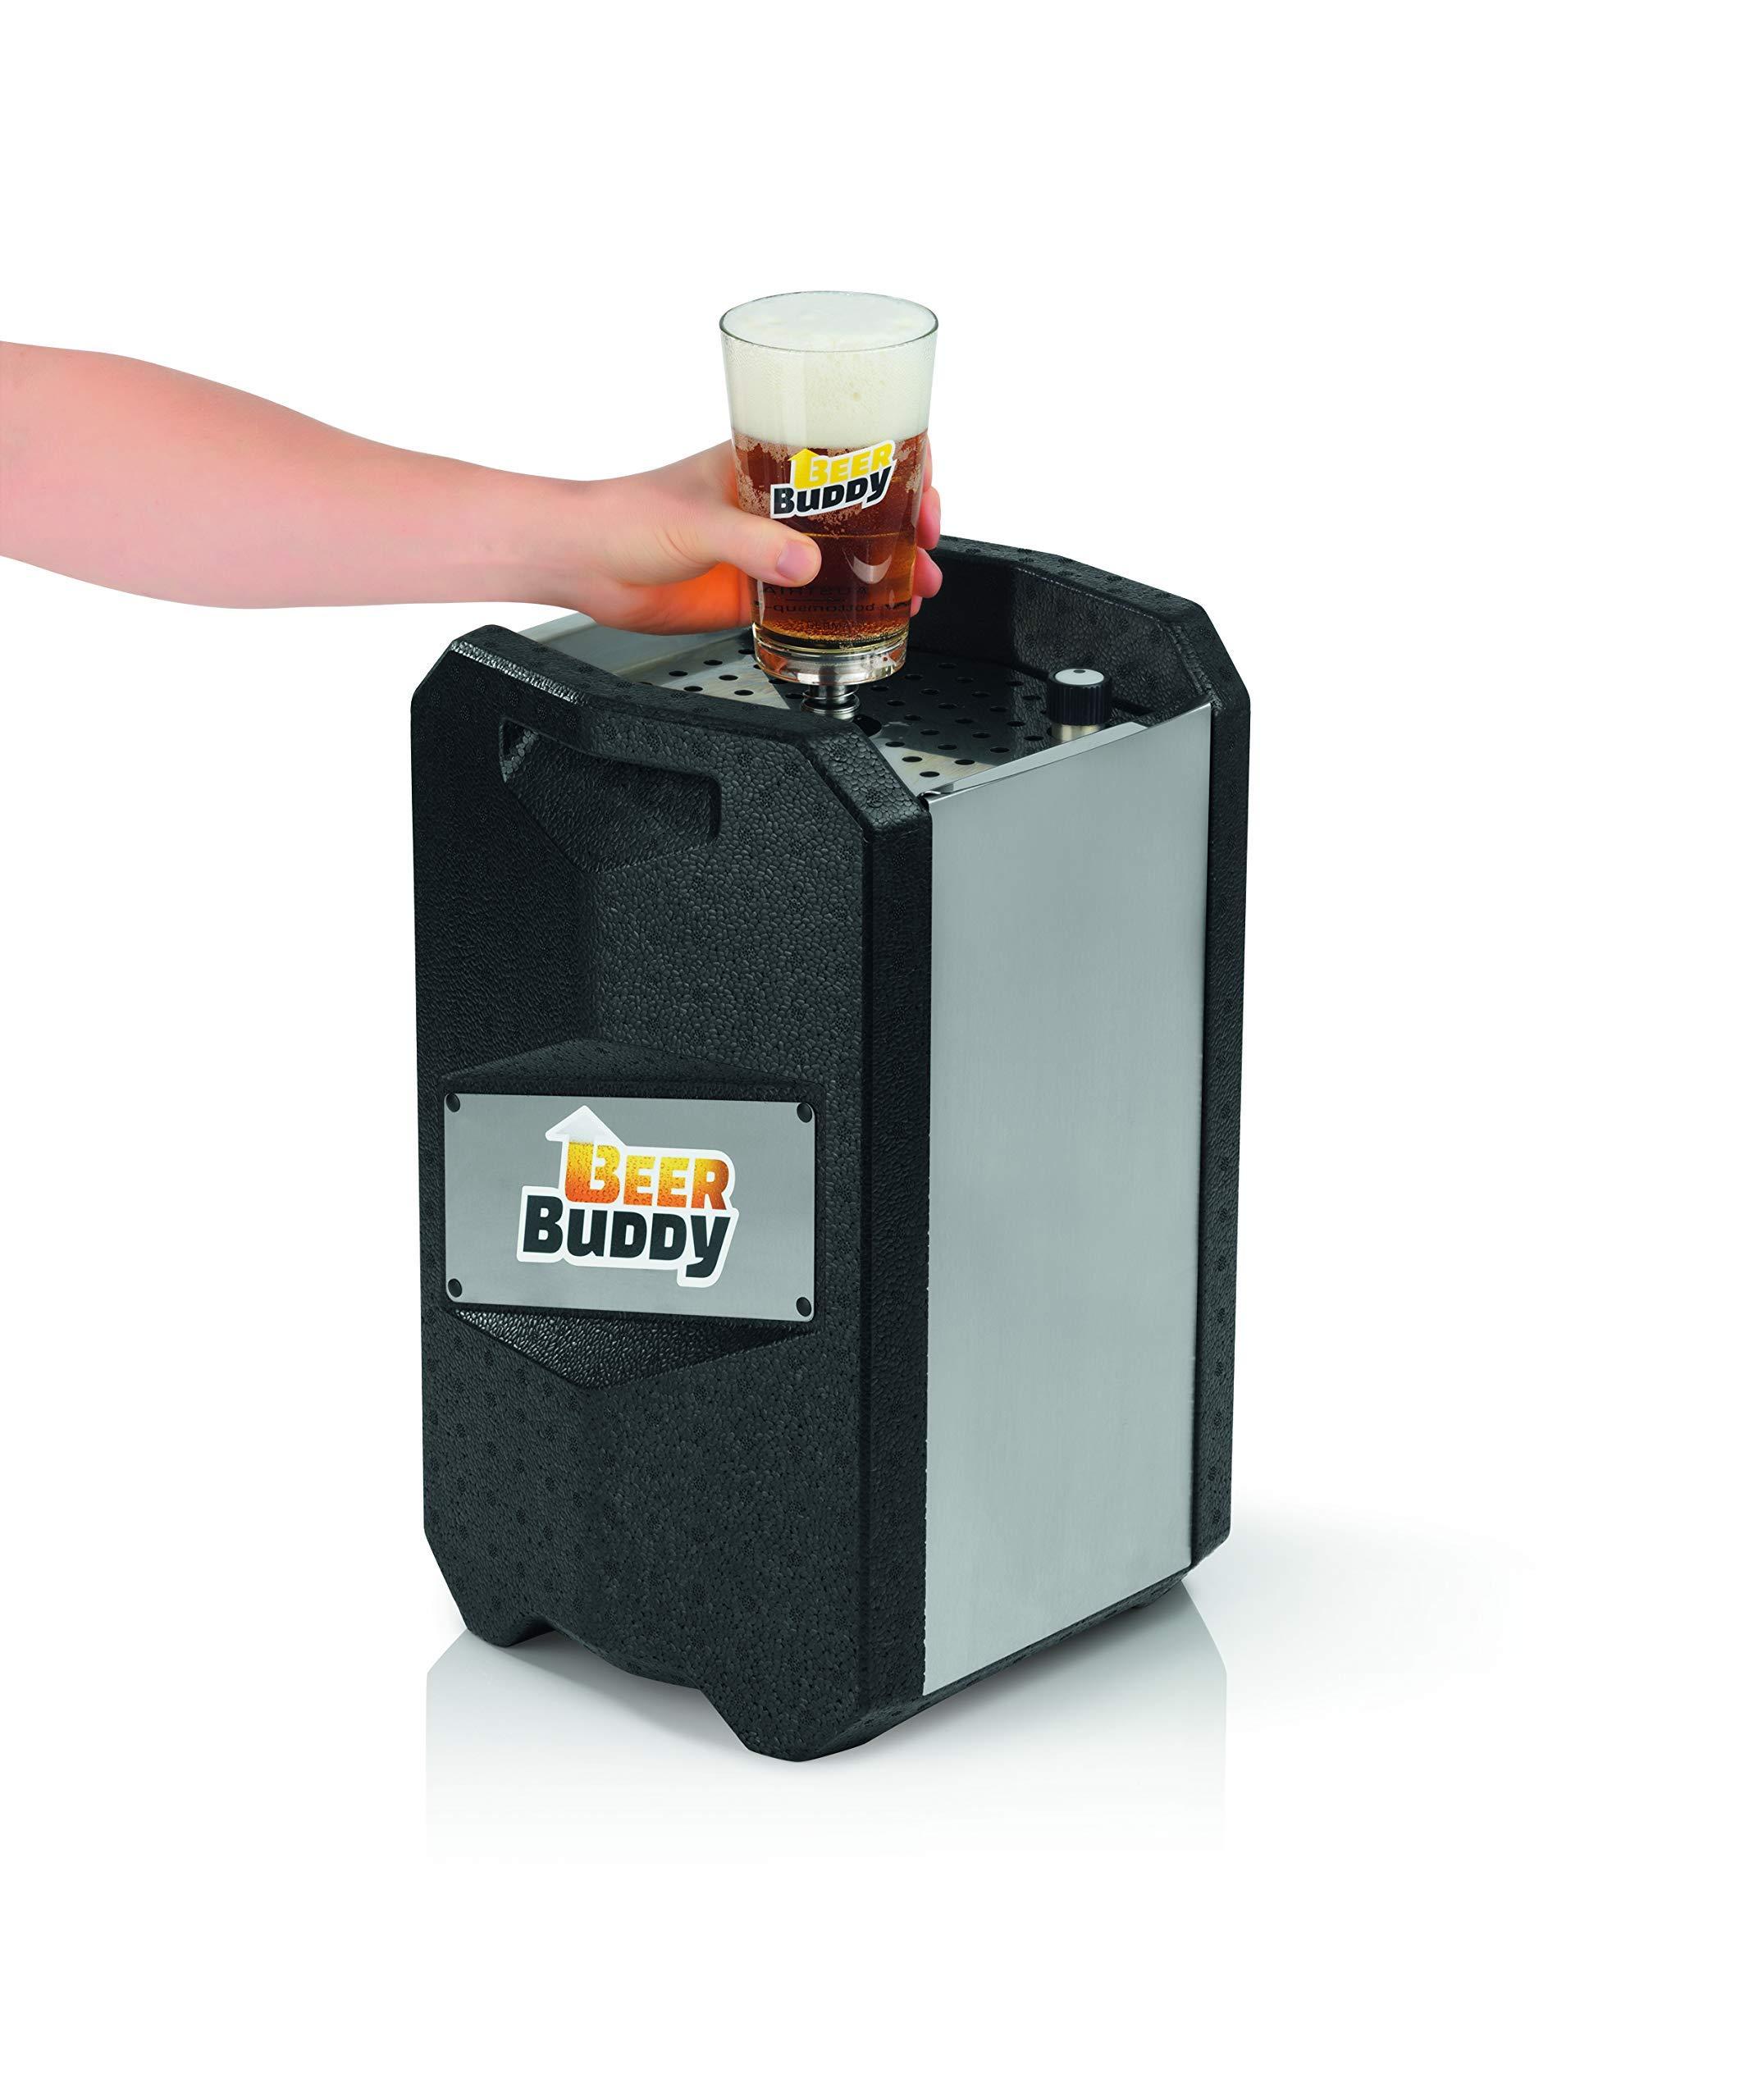 81C6HNeG7cL - Beer Buddy Version 2.0 latest version. Bottoms Up Beer Tap for 5 Litre Party Barrels